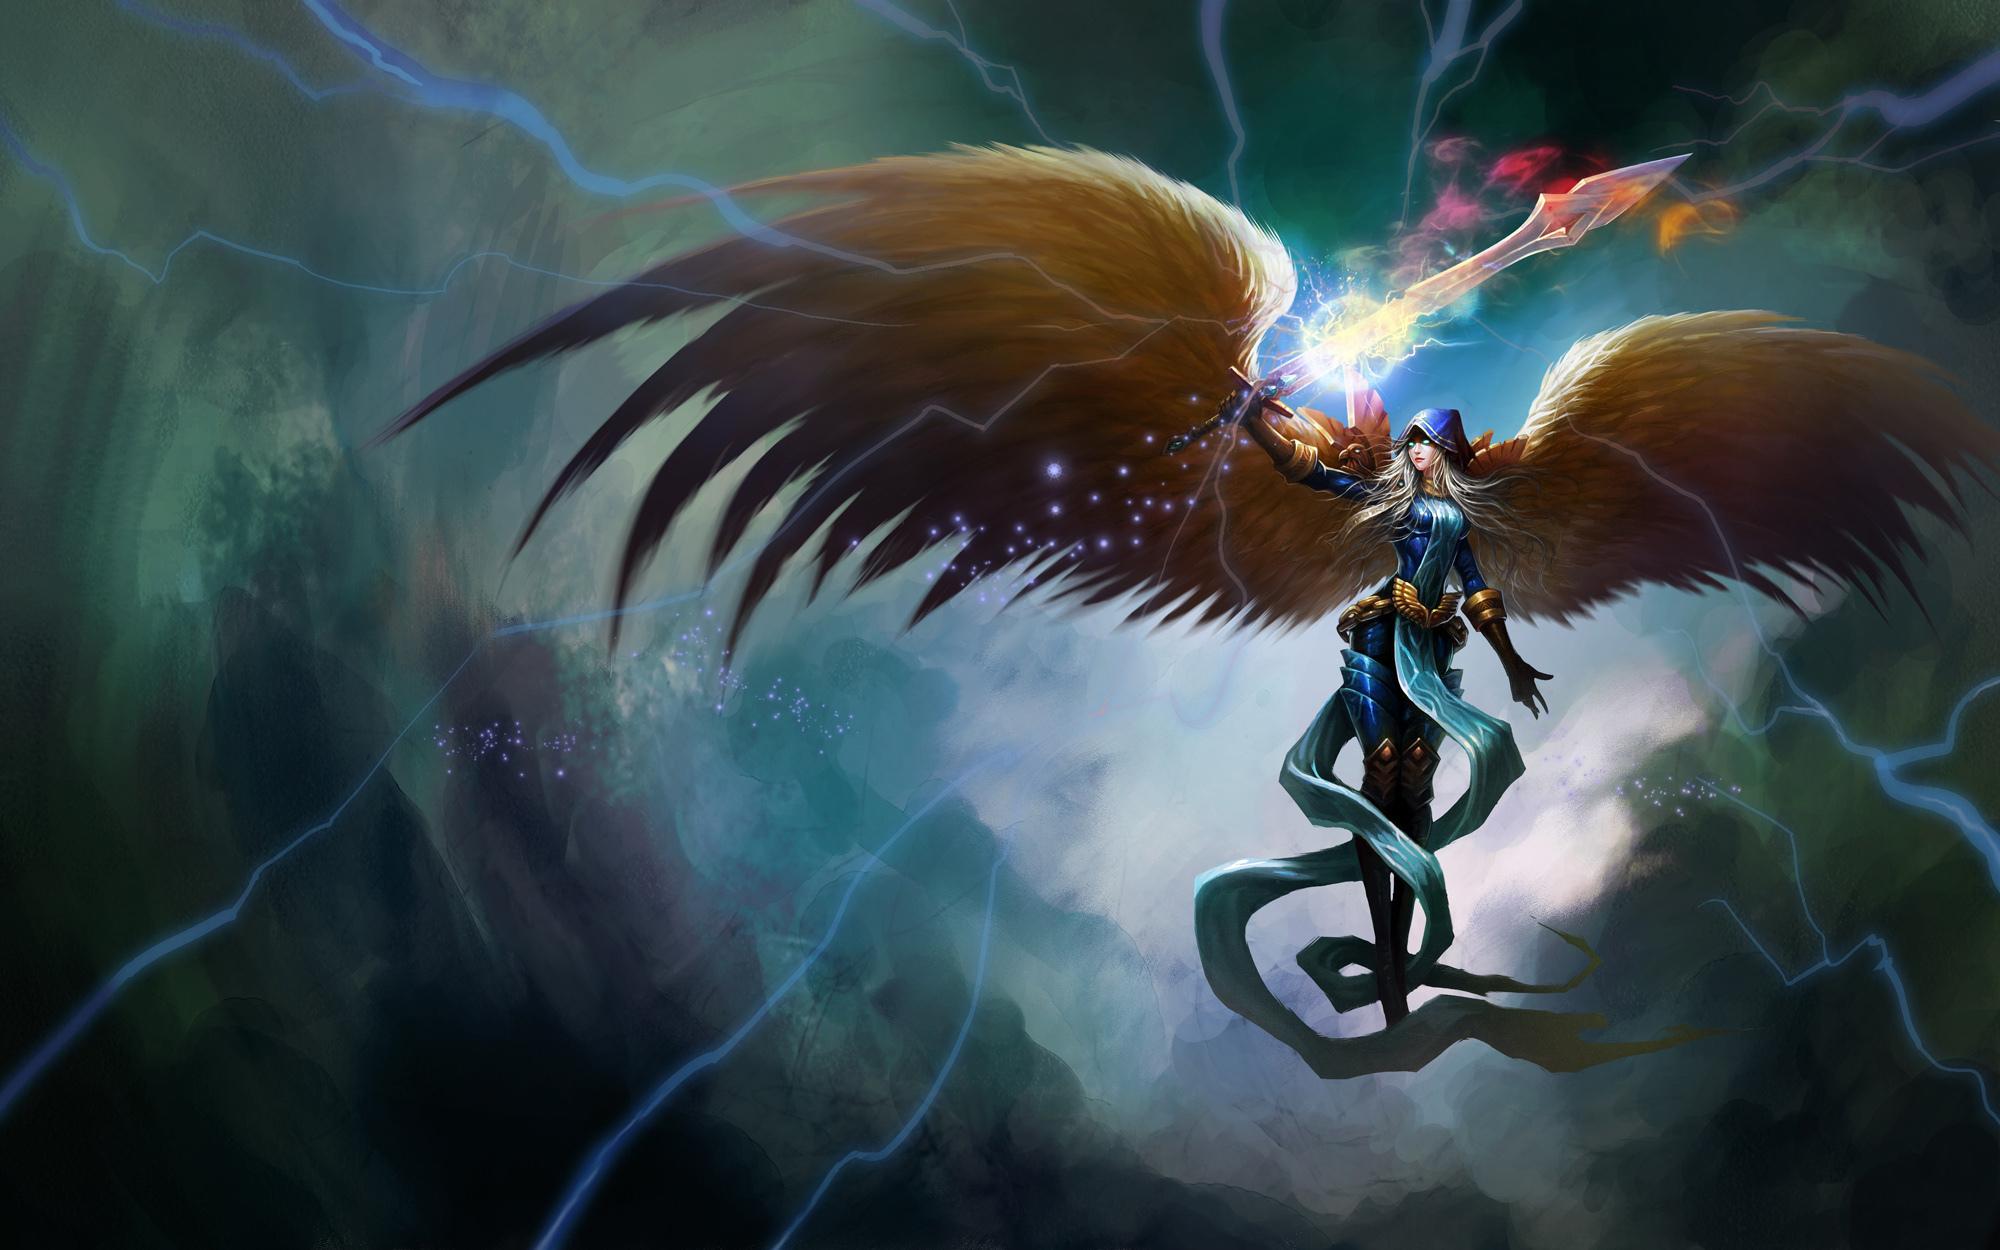 League of angels wallpaper hd 2000x1250